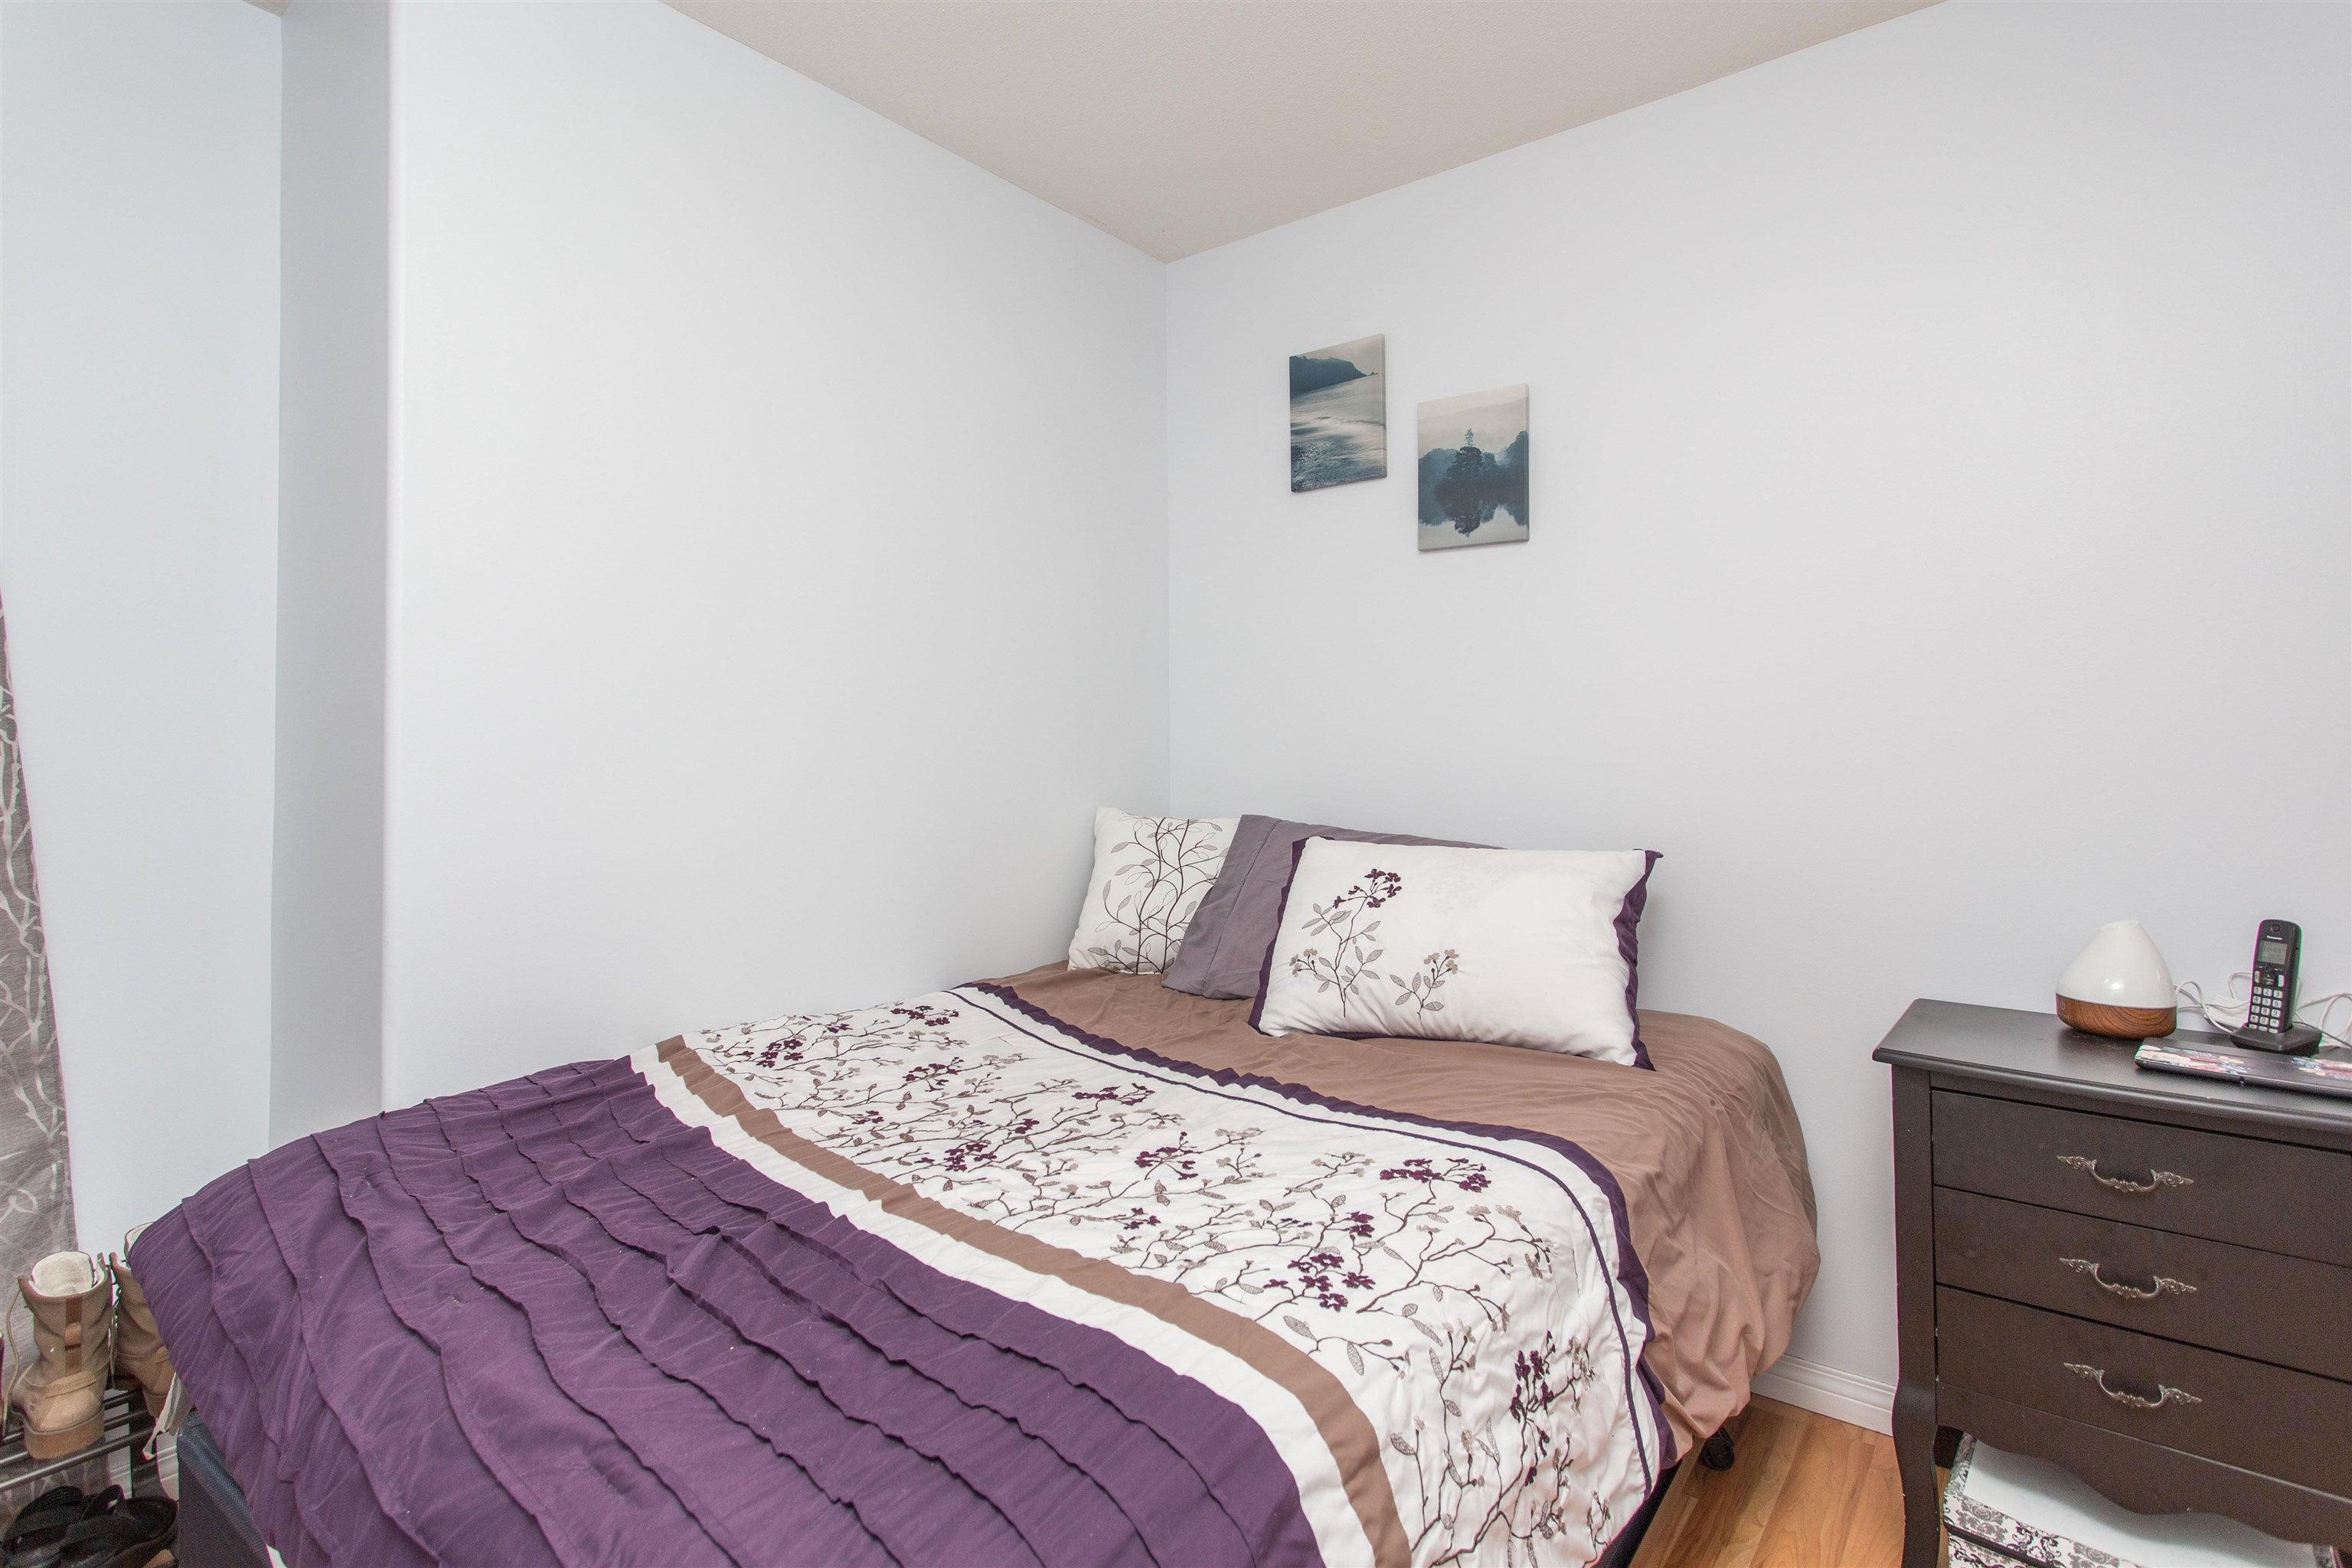 7 205 LEBLEU STREET - Maillardville Apartment/Condo for sale, 3 Bedrooms (R2625671) - #17